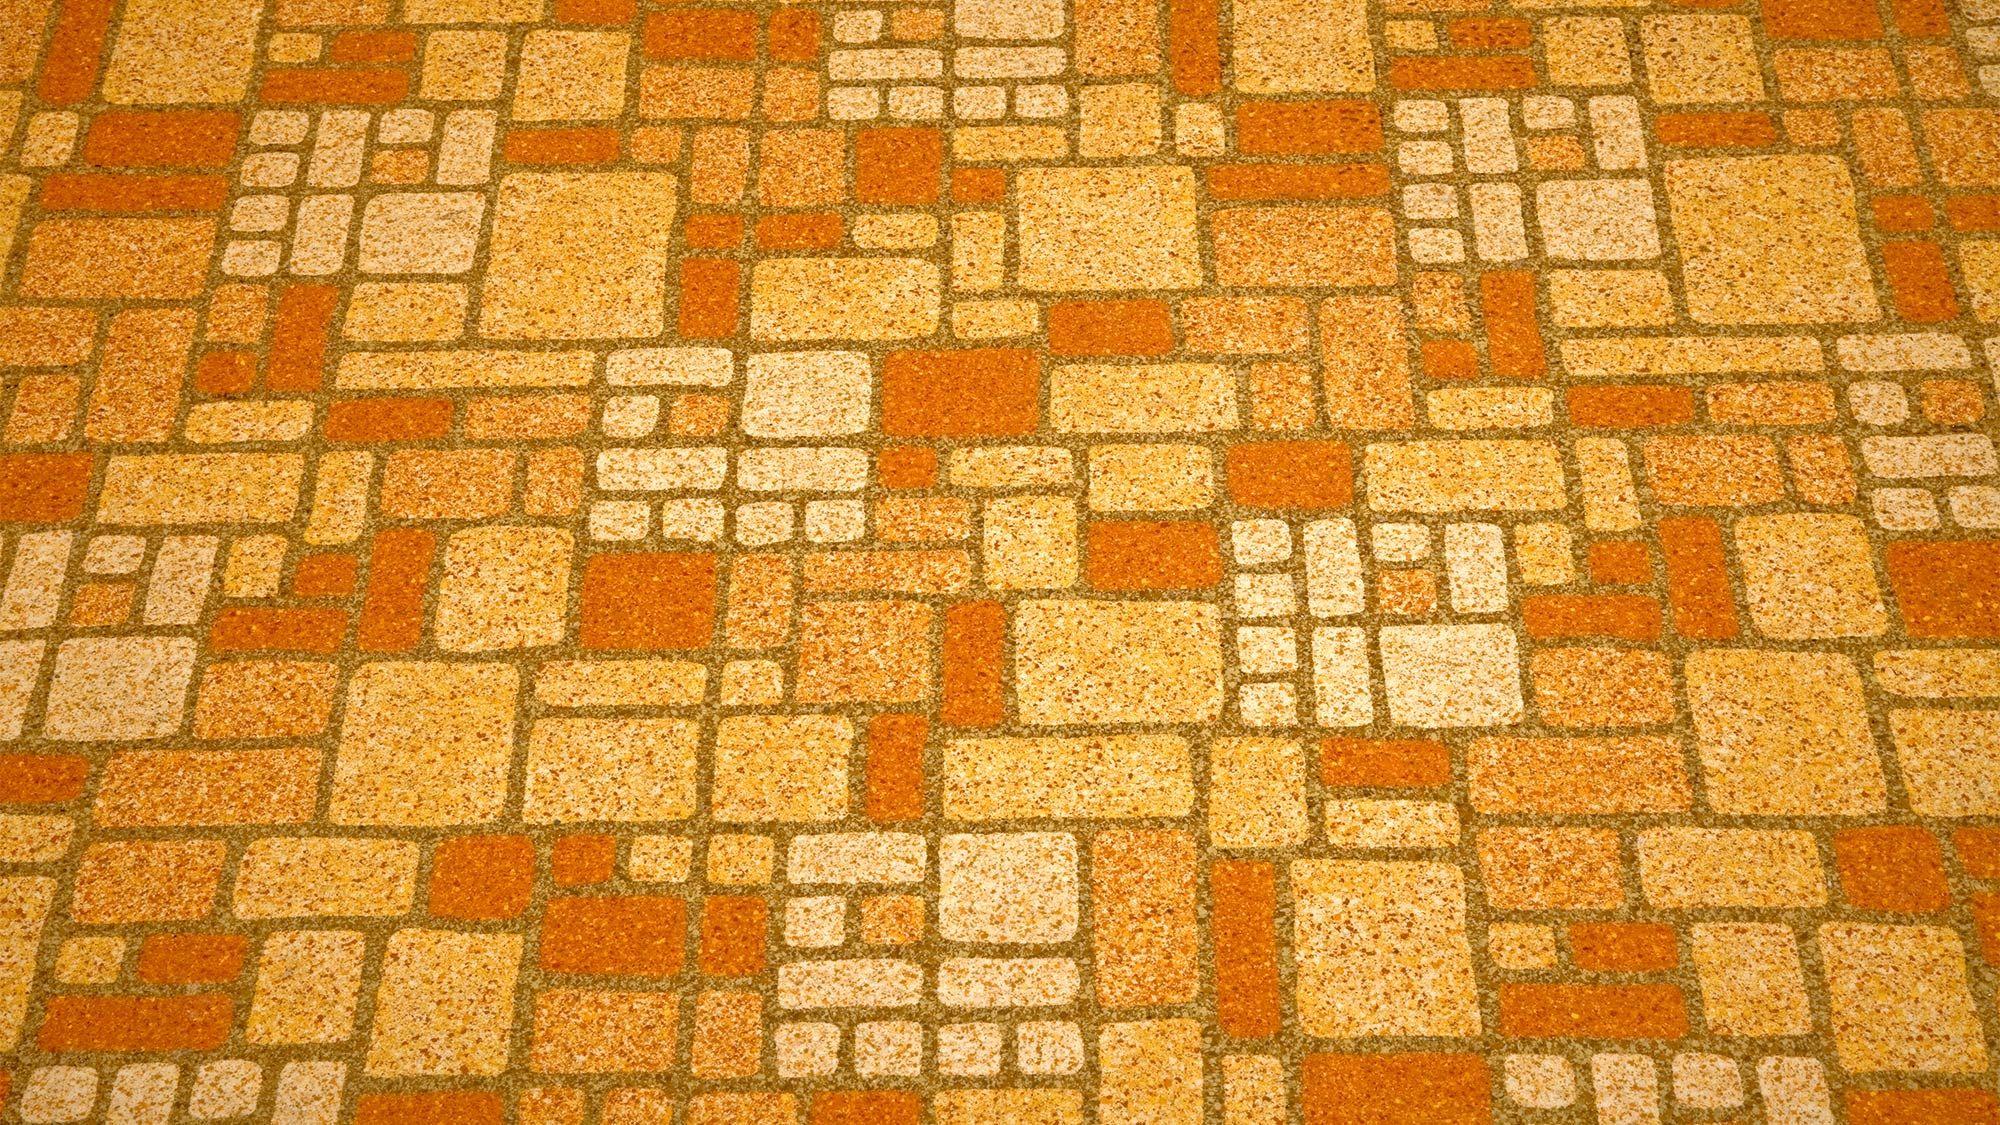 Worst Home Decor Of The 1960s Linoleum Childhood Memories Linoleum Flooring